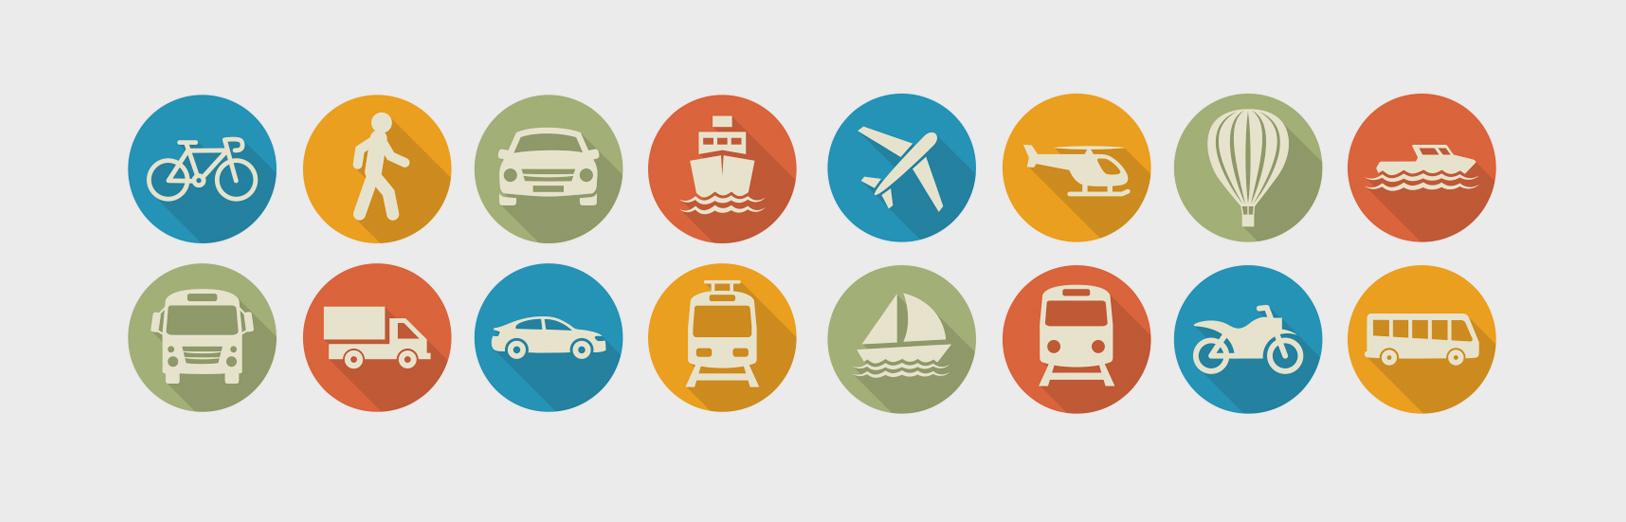 Lectia de portugheza - Mijloacele de transport in comun in limba portugheza